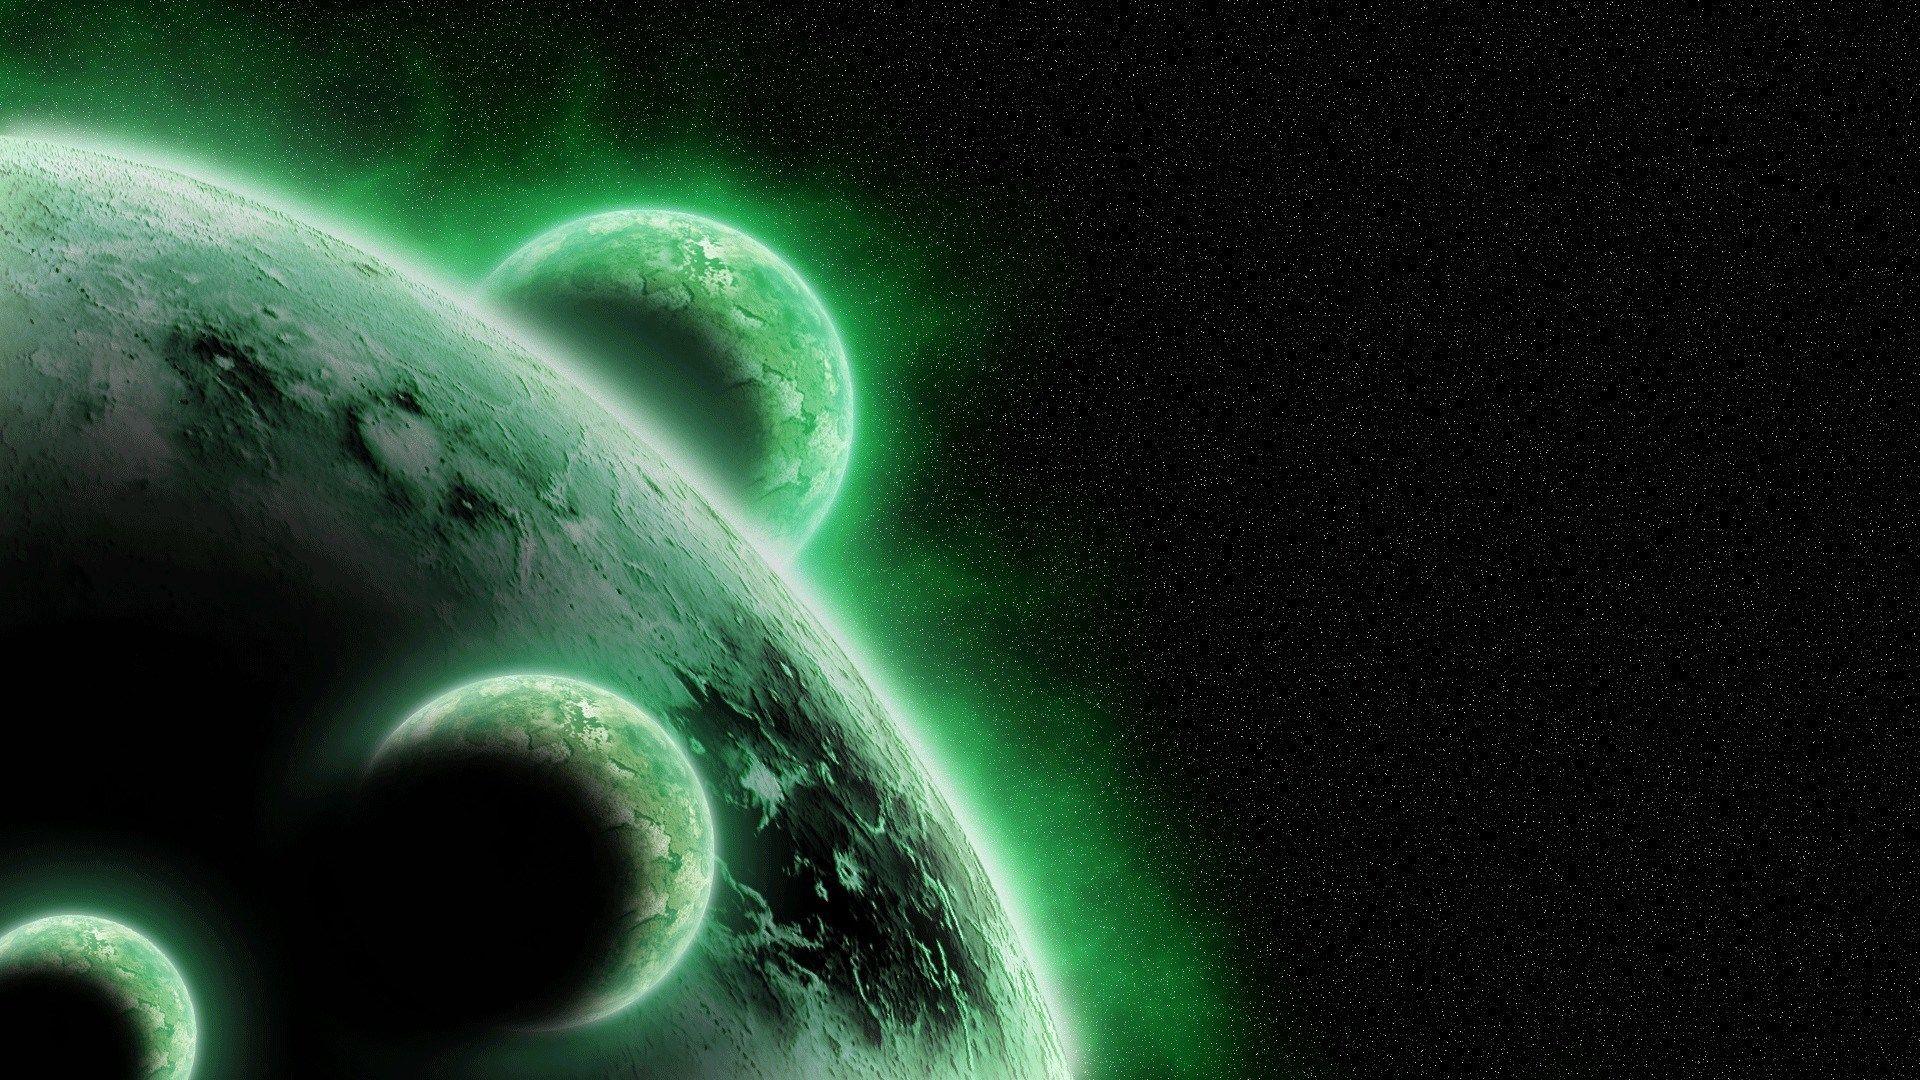 green planet wallpaper hd | ololoshenka | pinterest | planets and